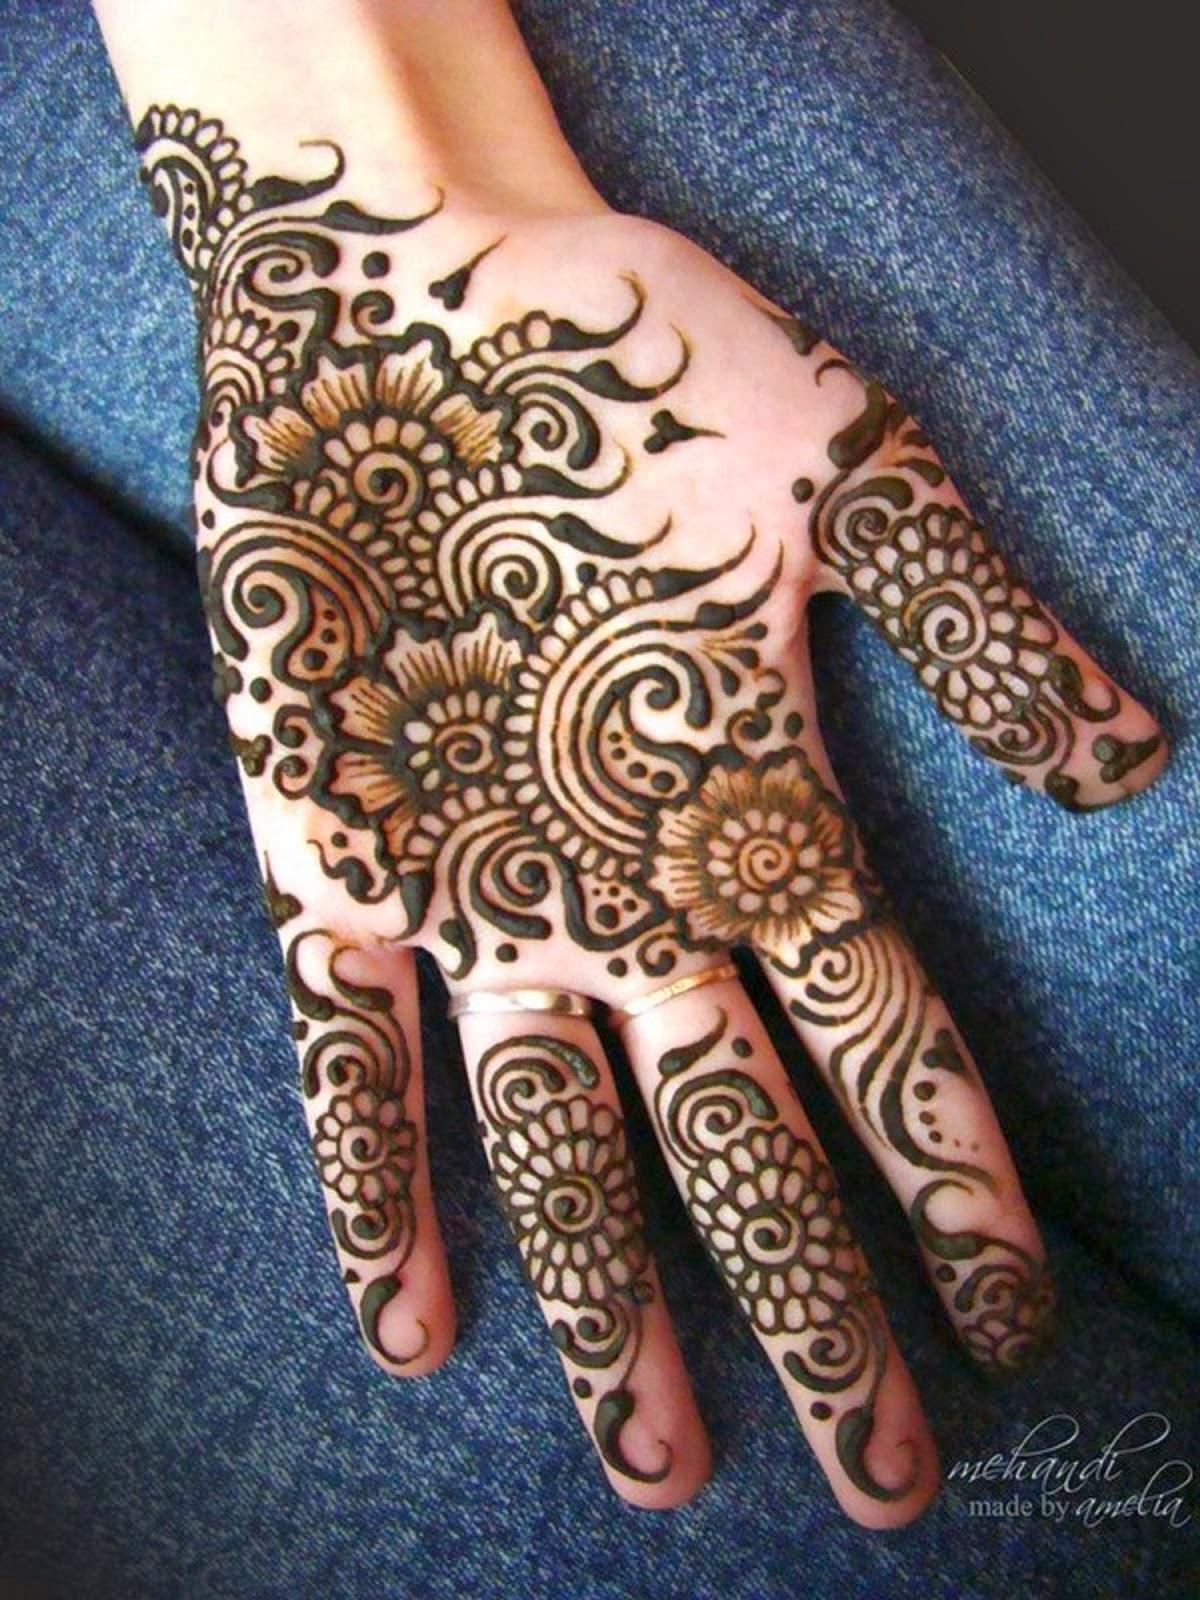 Mehndi Designs With : Mehndi designs for girls amelia